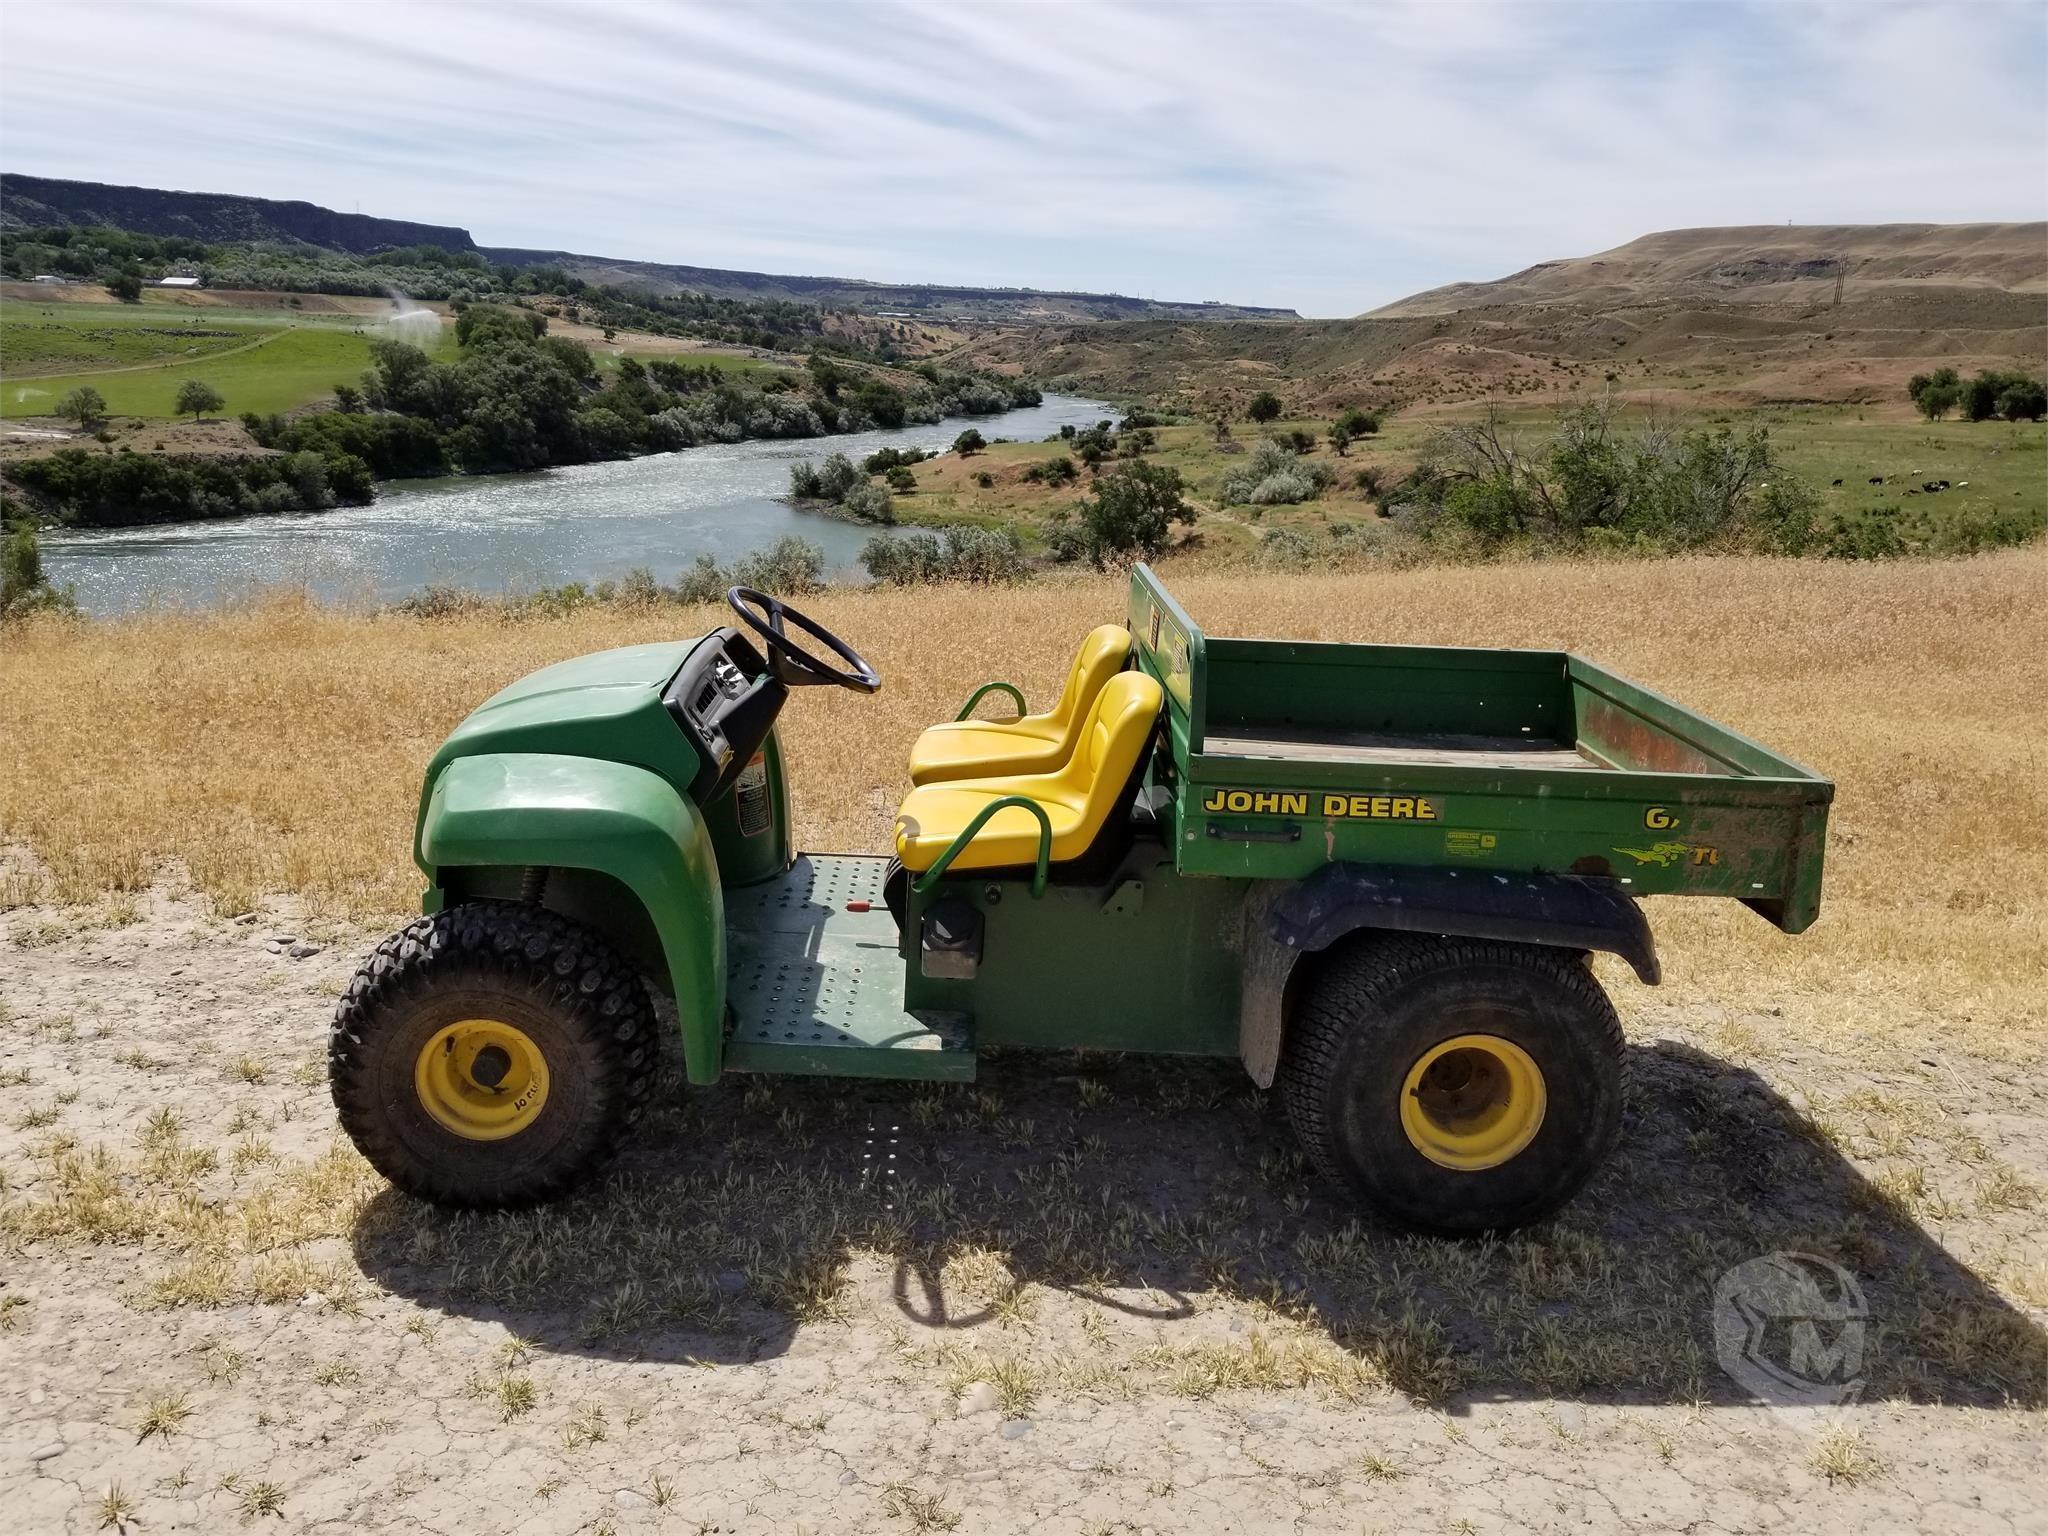 John Deere Gator Wir John Deere Gator Turf Auction Results In Bliss Idaho Of John Deere Gator Wir